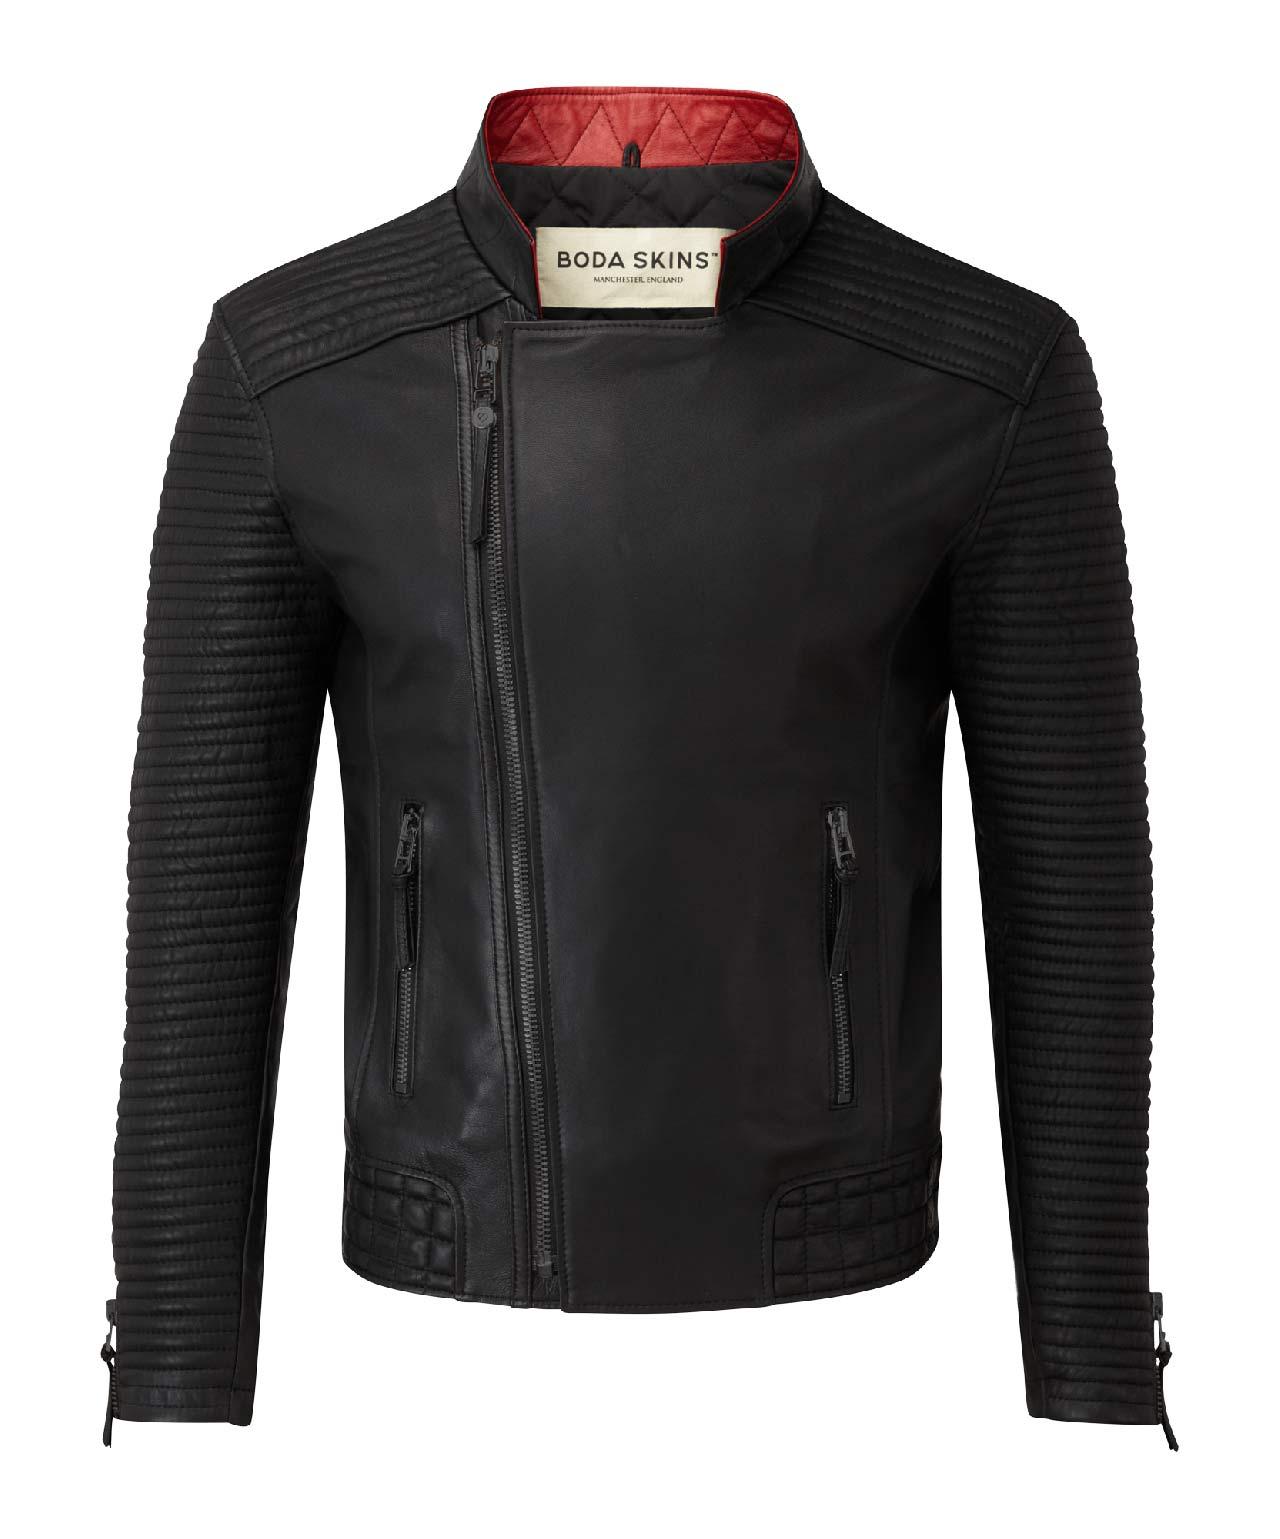 boda-skins-rider-zipped-black-png_1